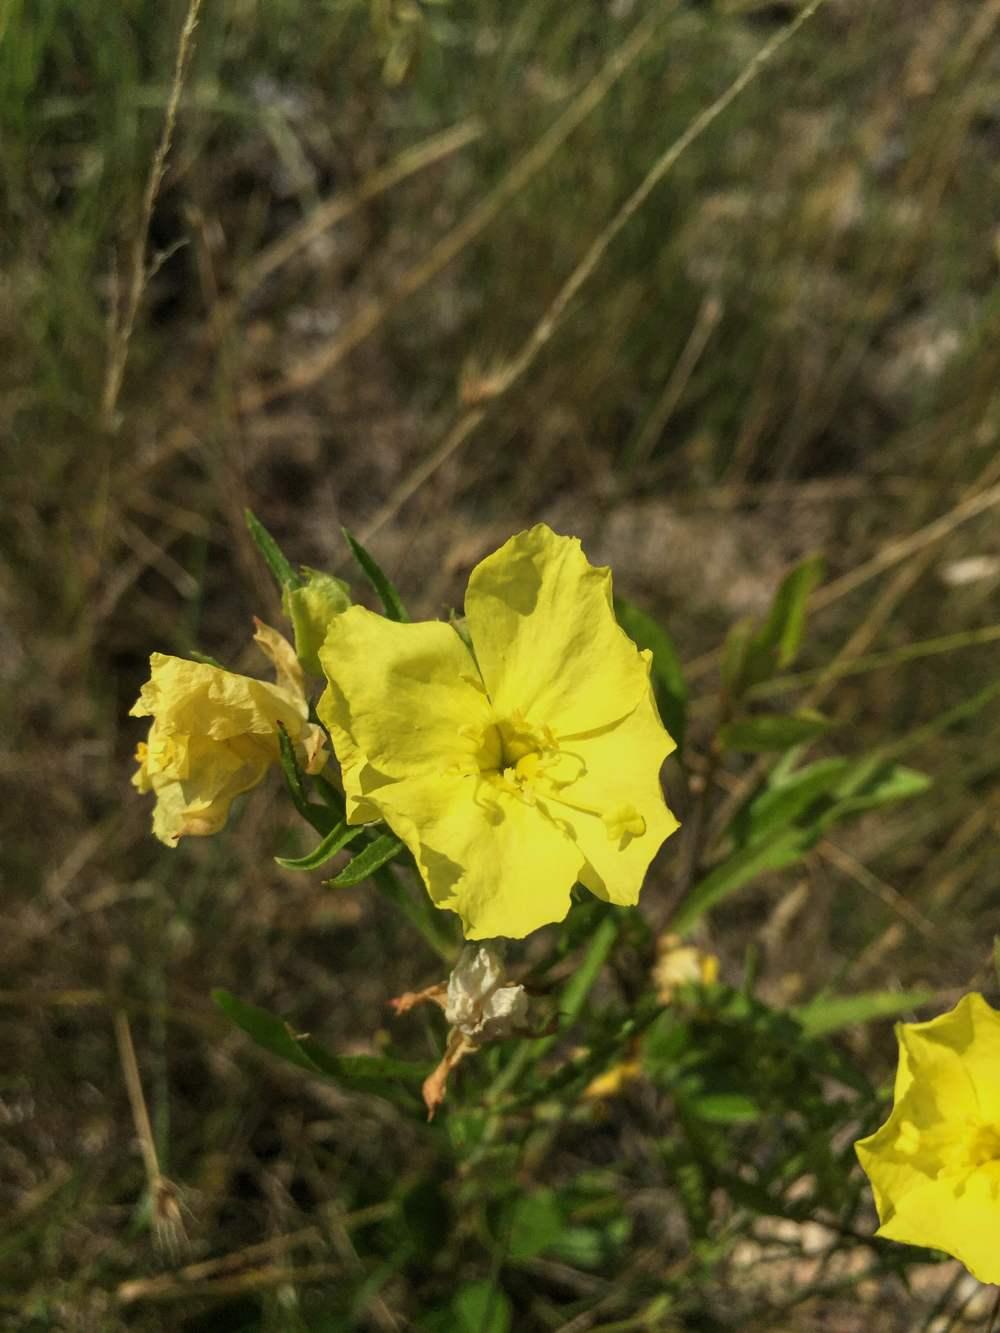 Calylophus berlandieri (Oenothera)